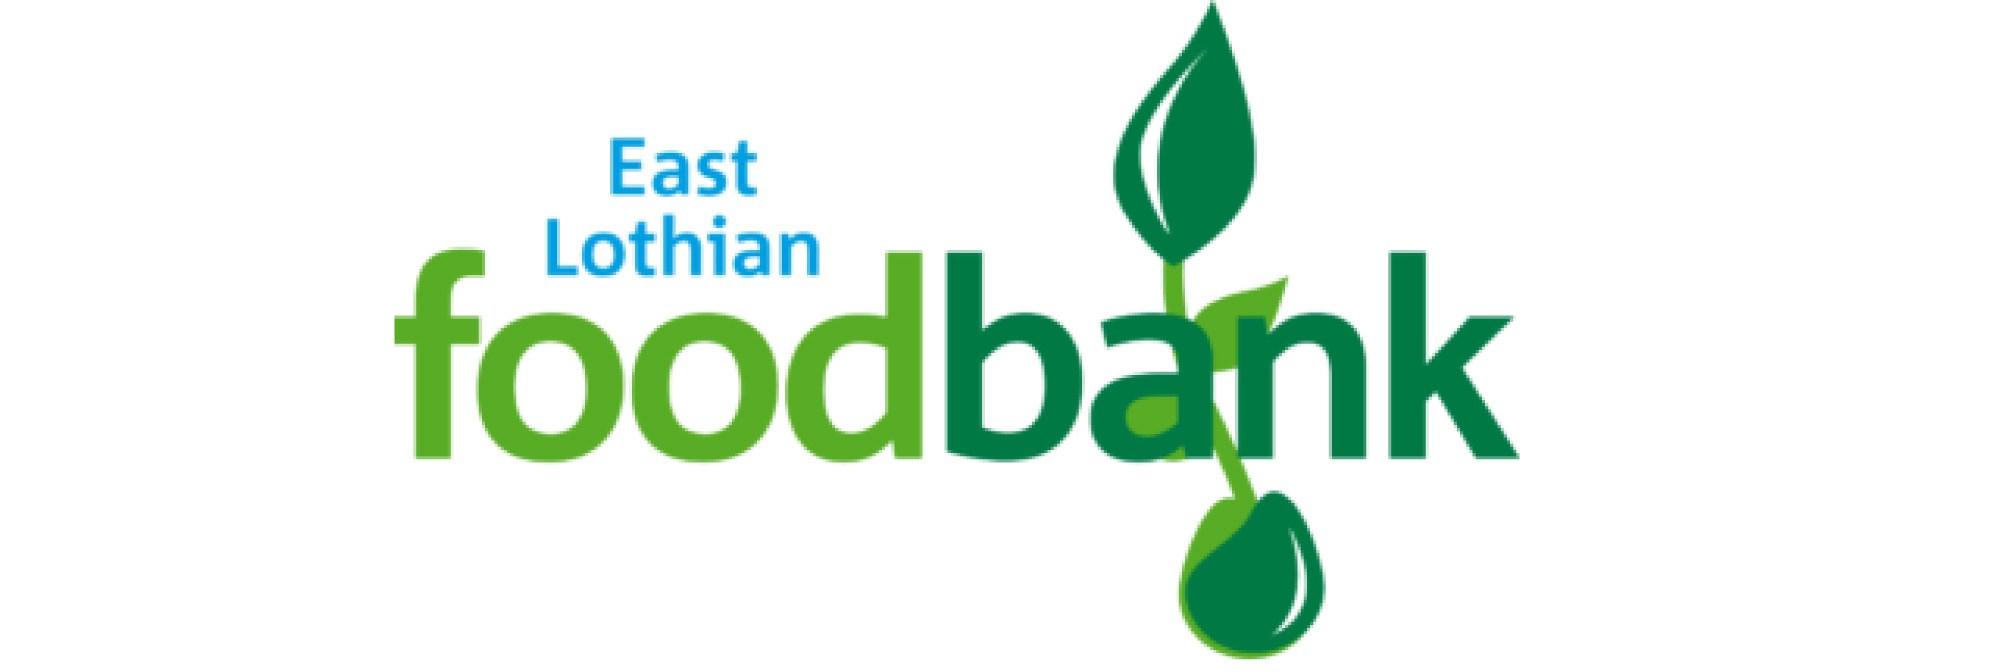 PLHS helping East Lothian food bank